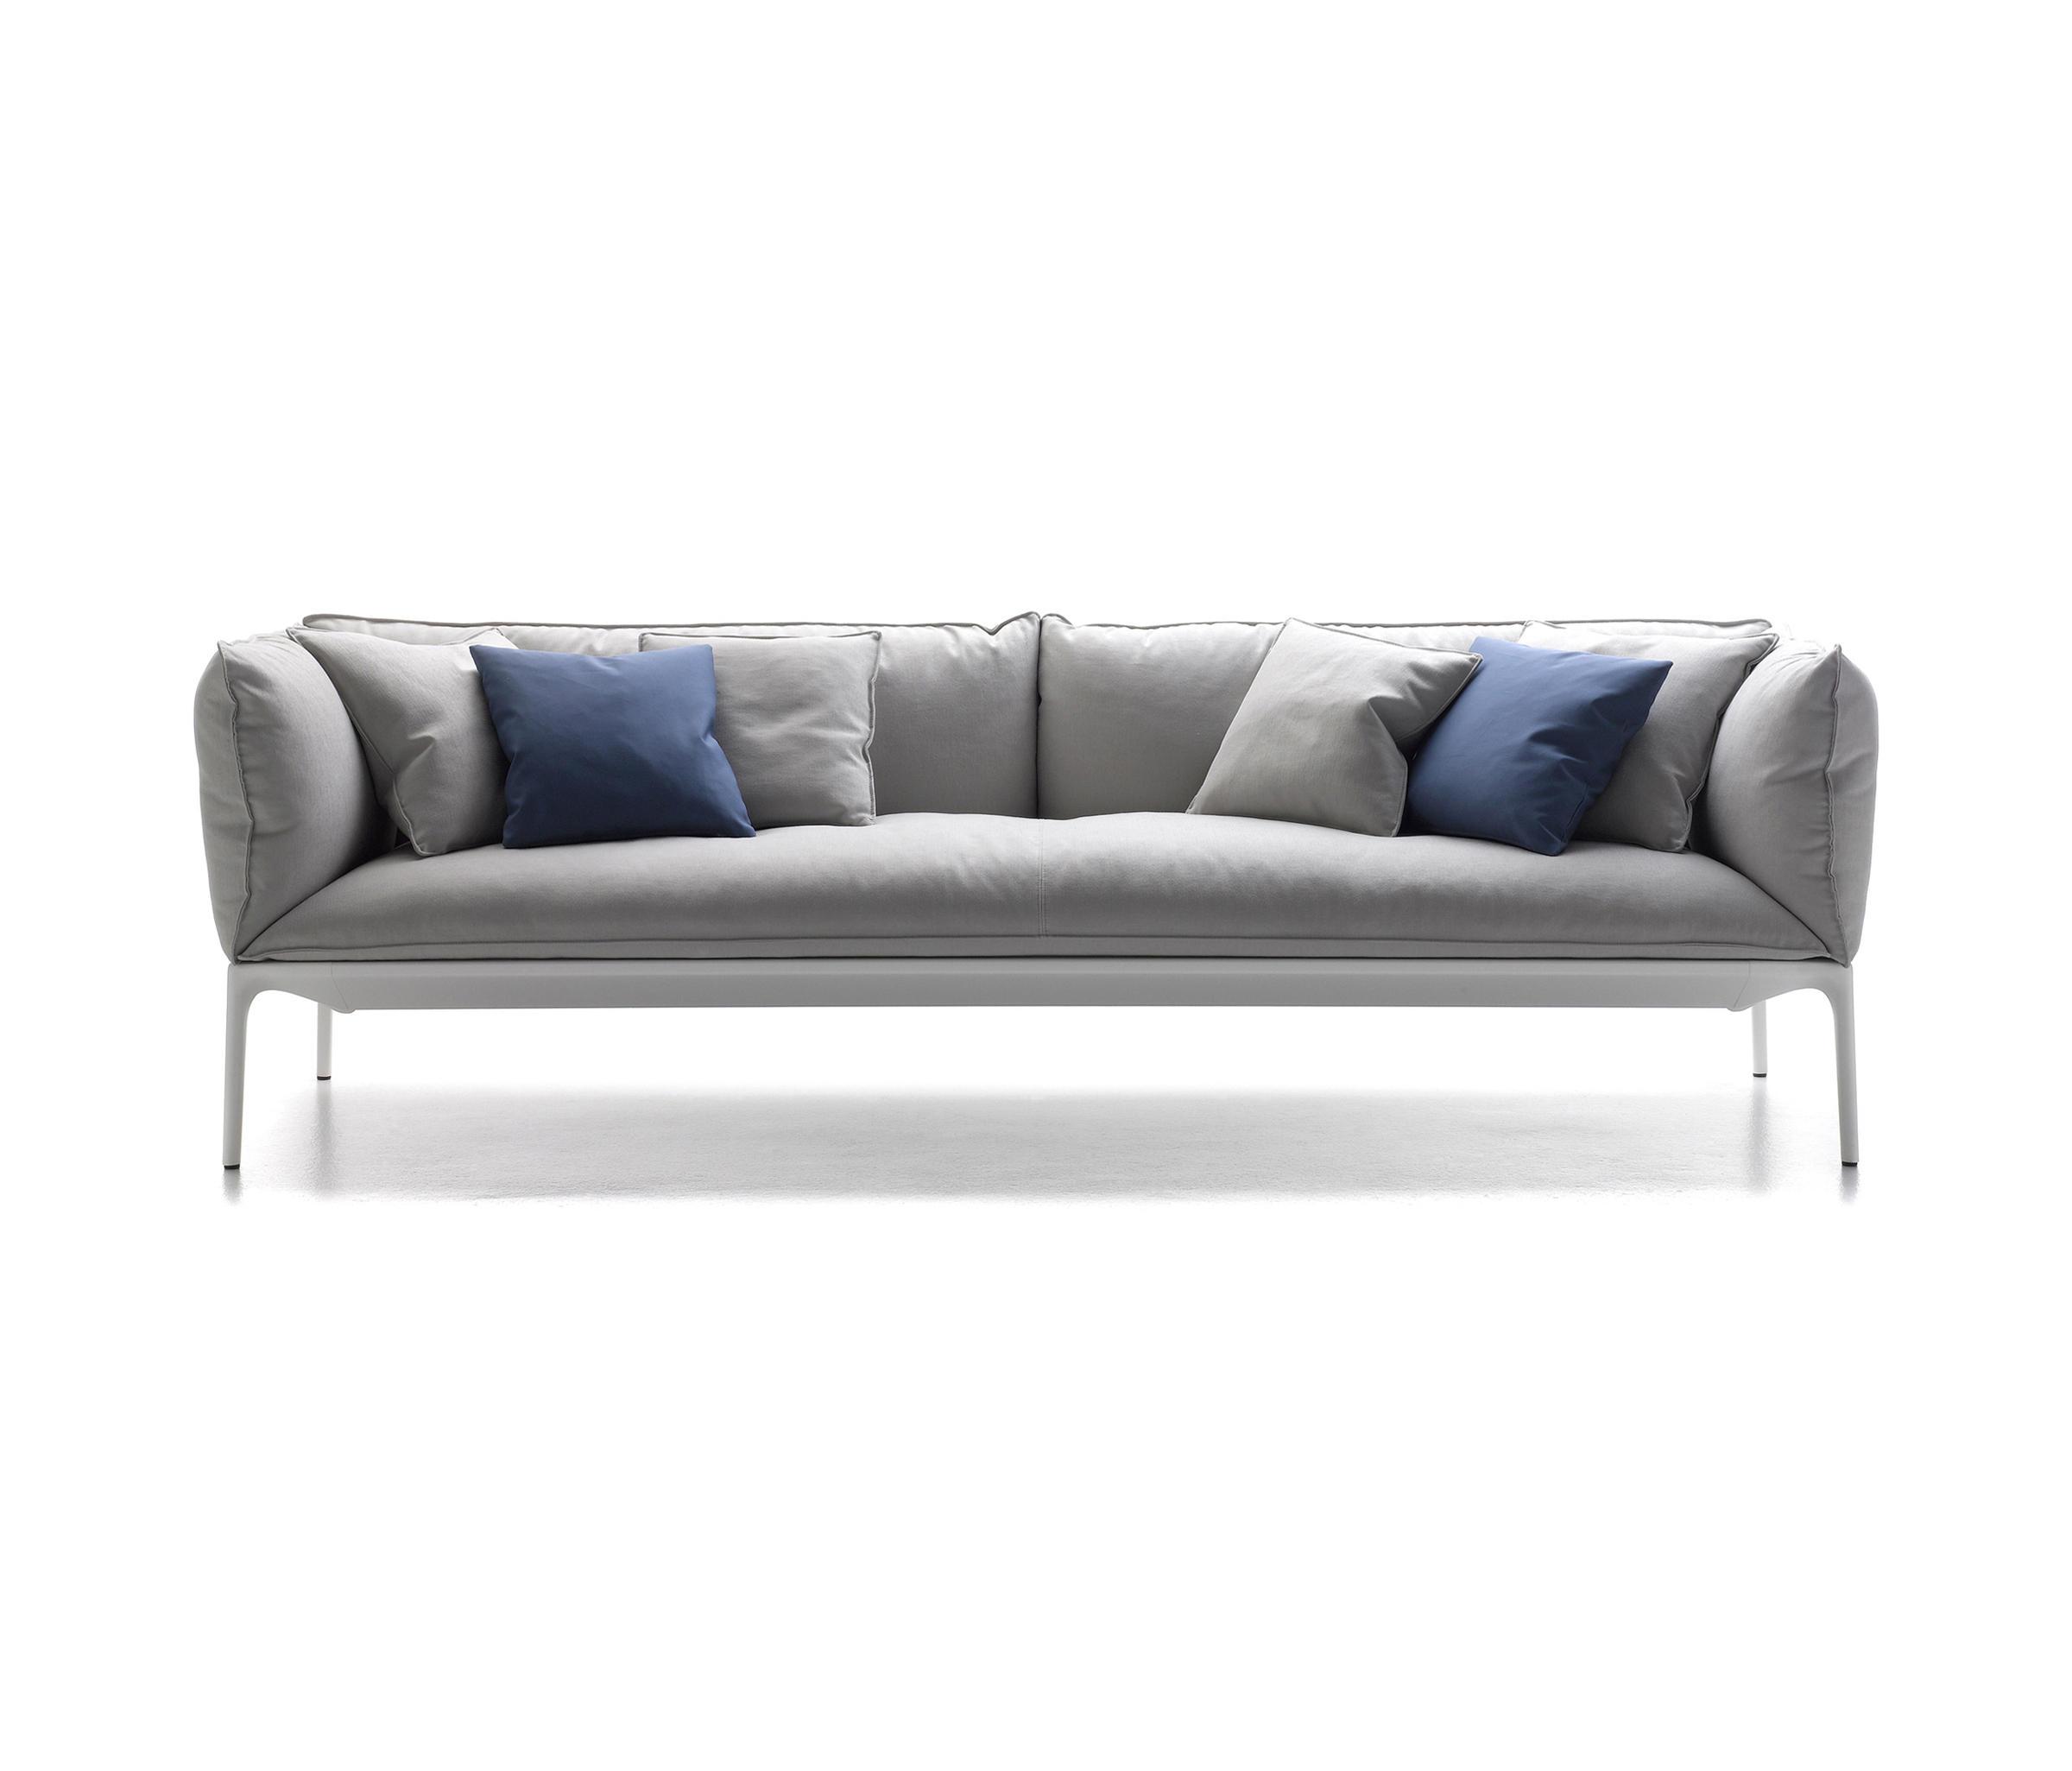 yale sofa lounge sofas from mdf italia architonic. Black Bedroom Furniture Sets. Home Design Ideas